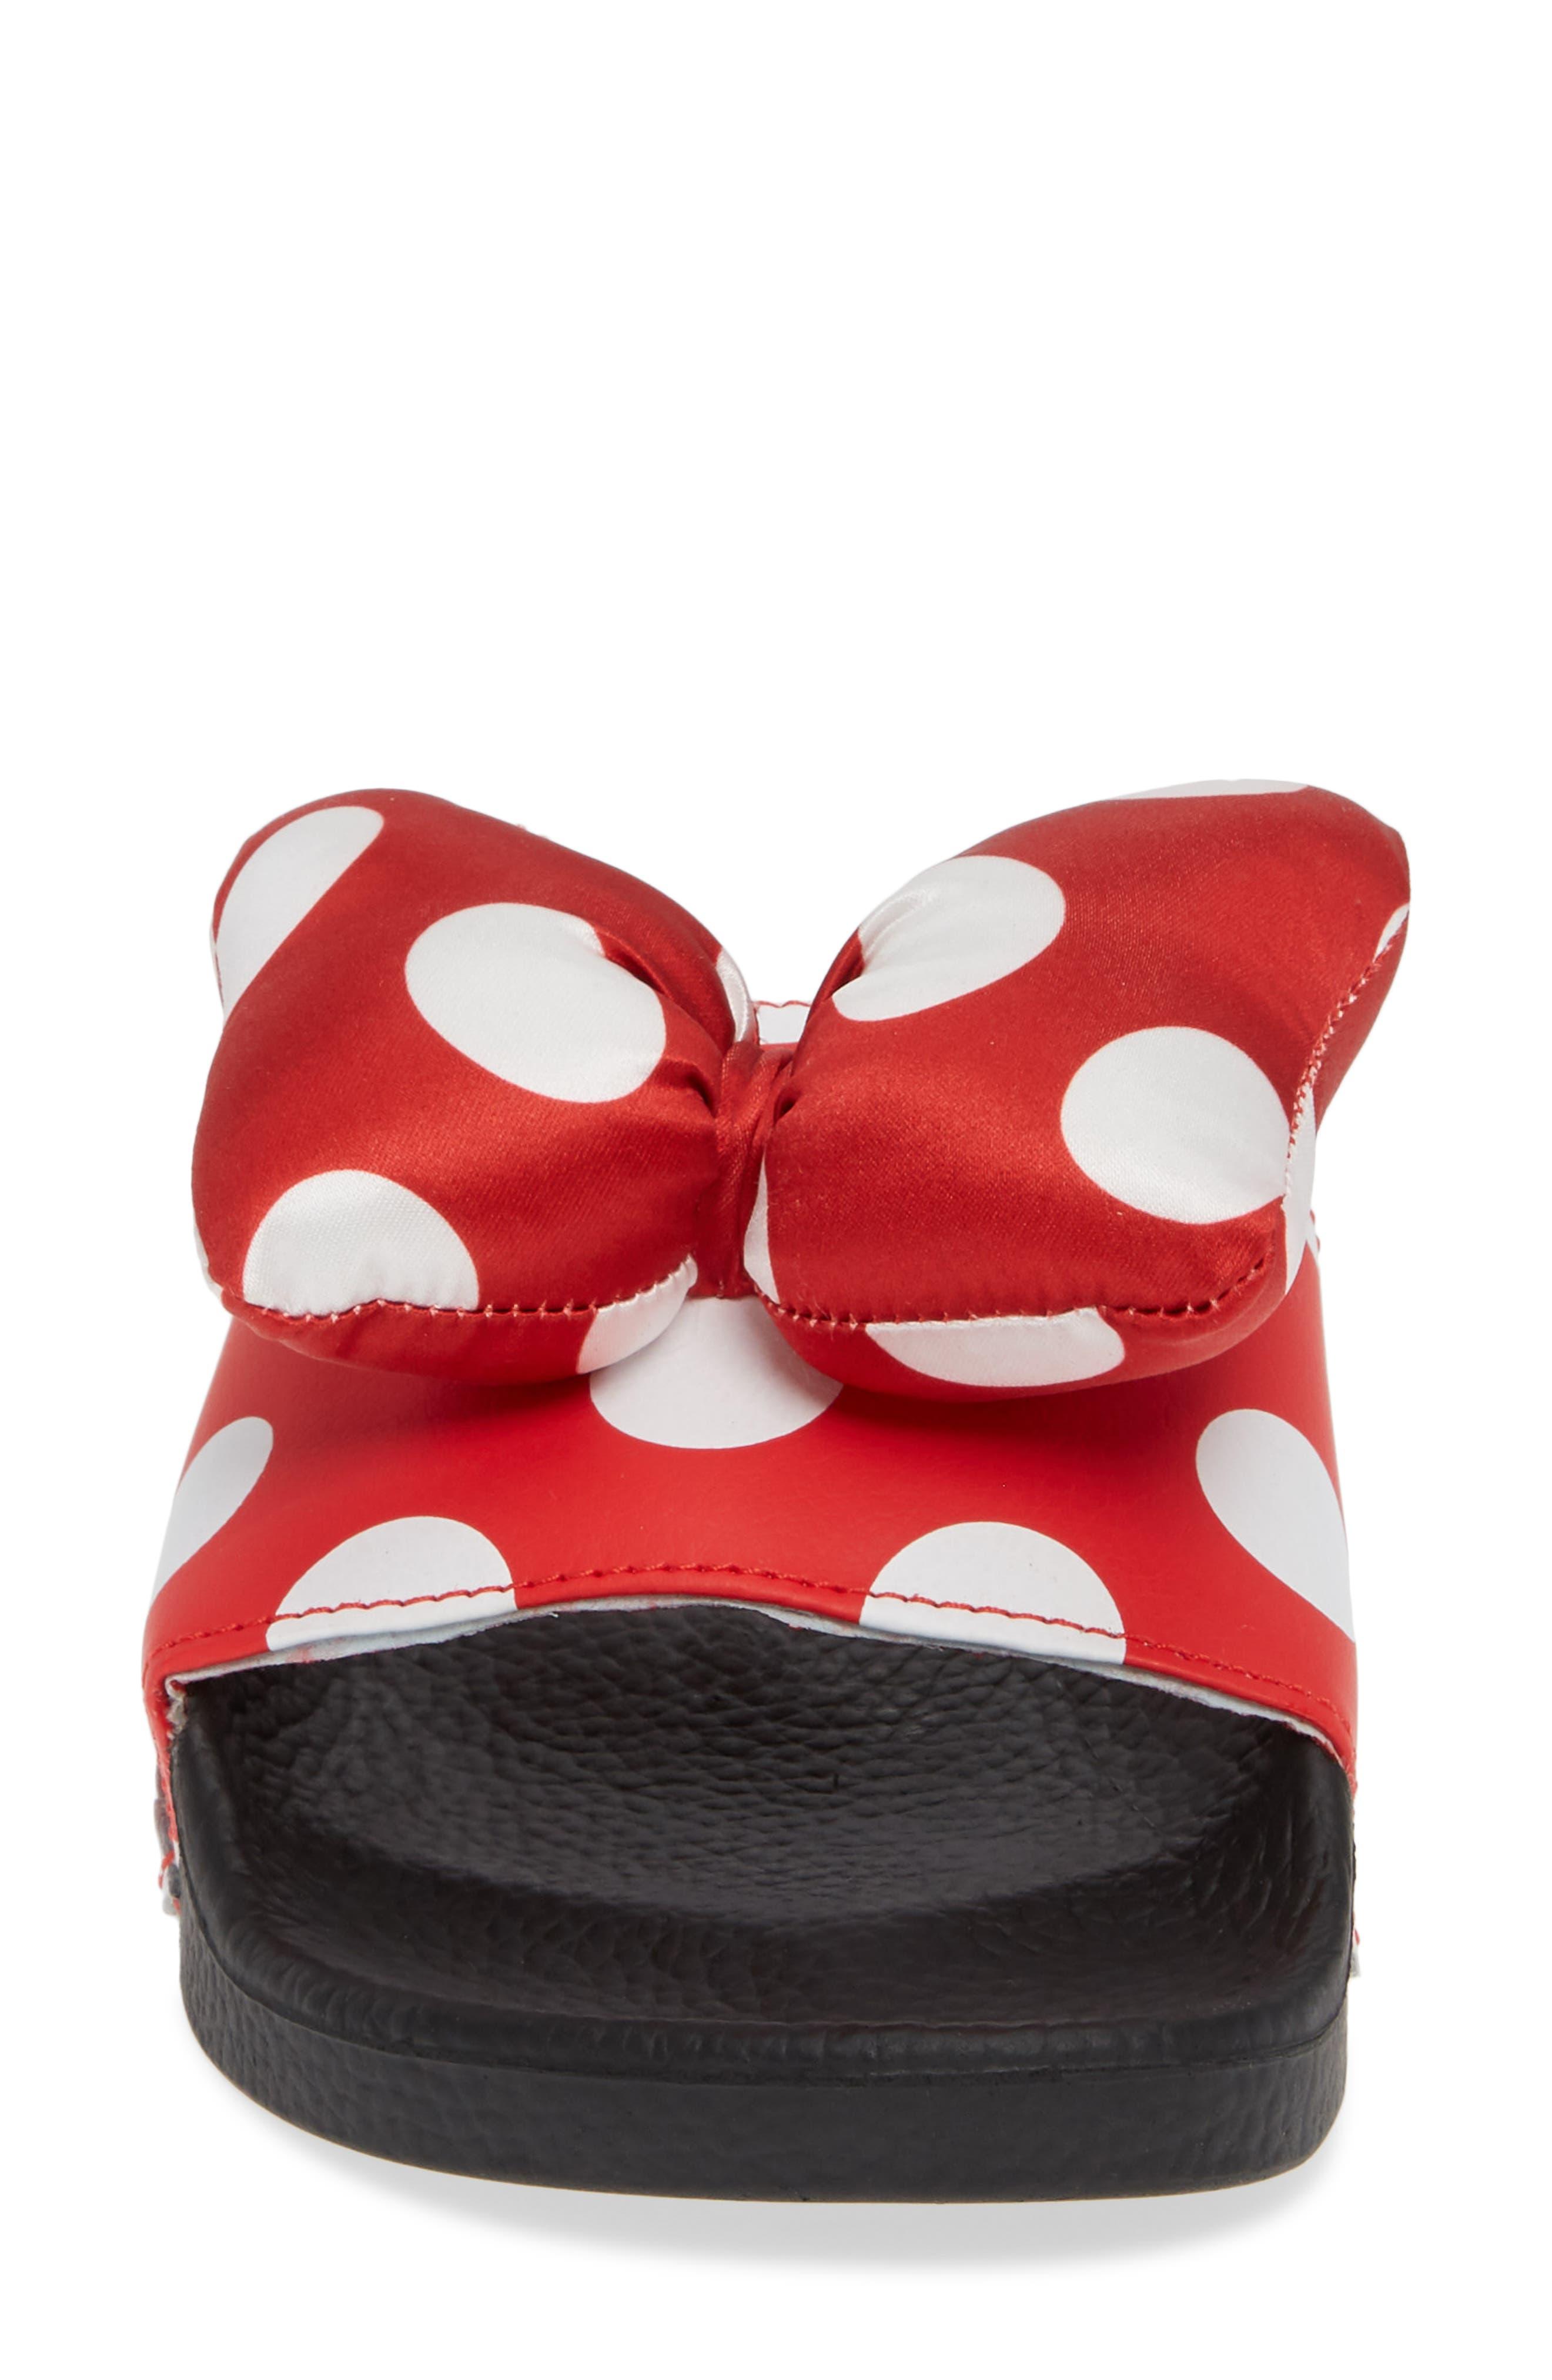 x Disney Minnie Mouse Slide Sandal,                             Alternate thumbnail 4, color,                             600